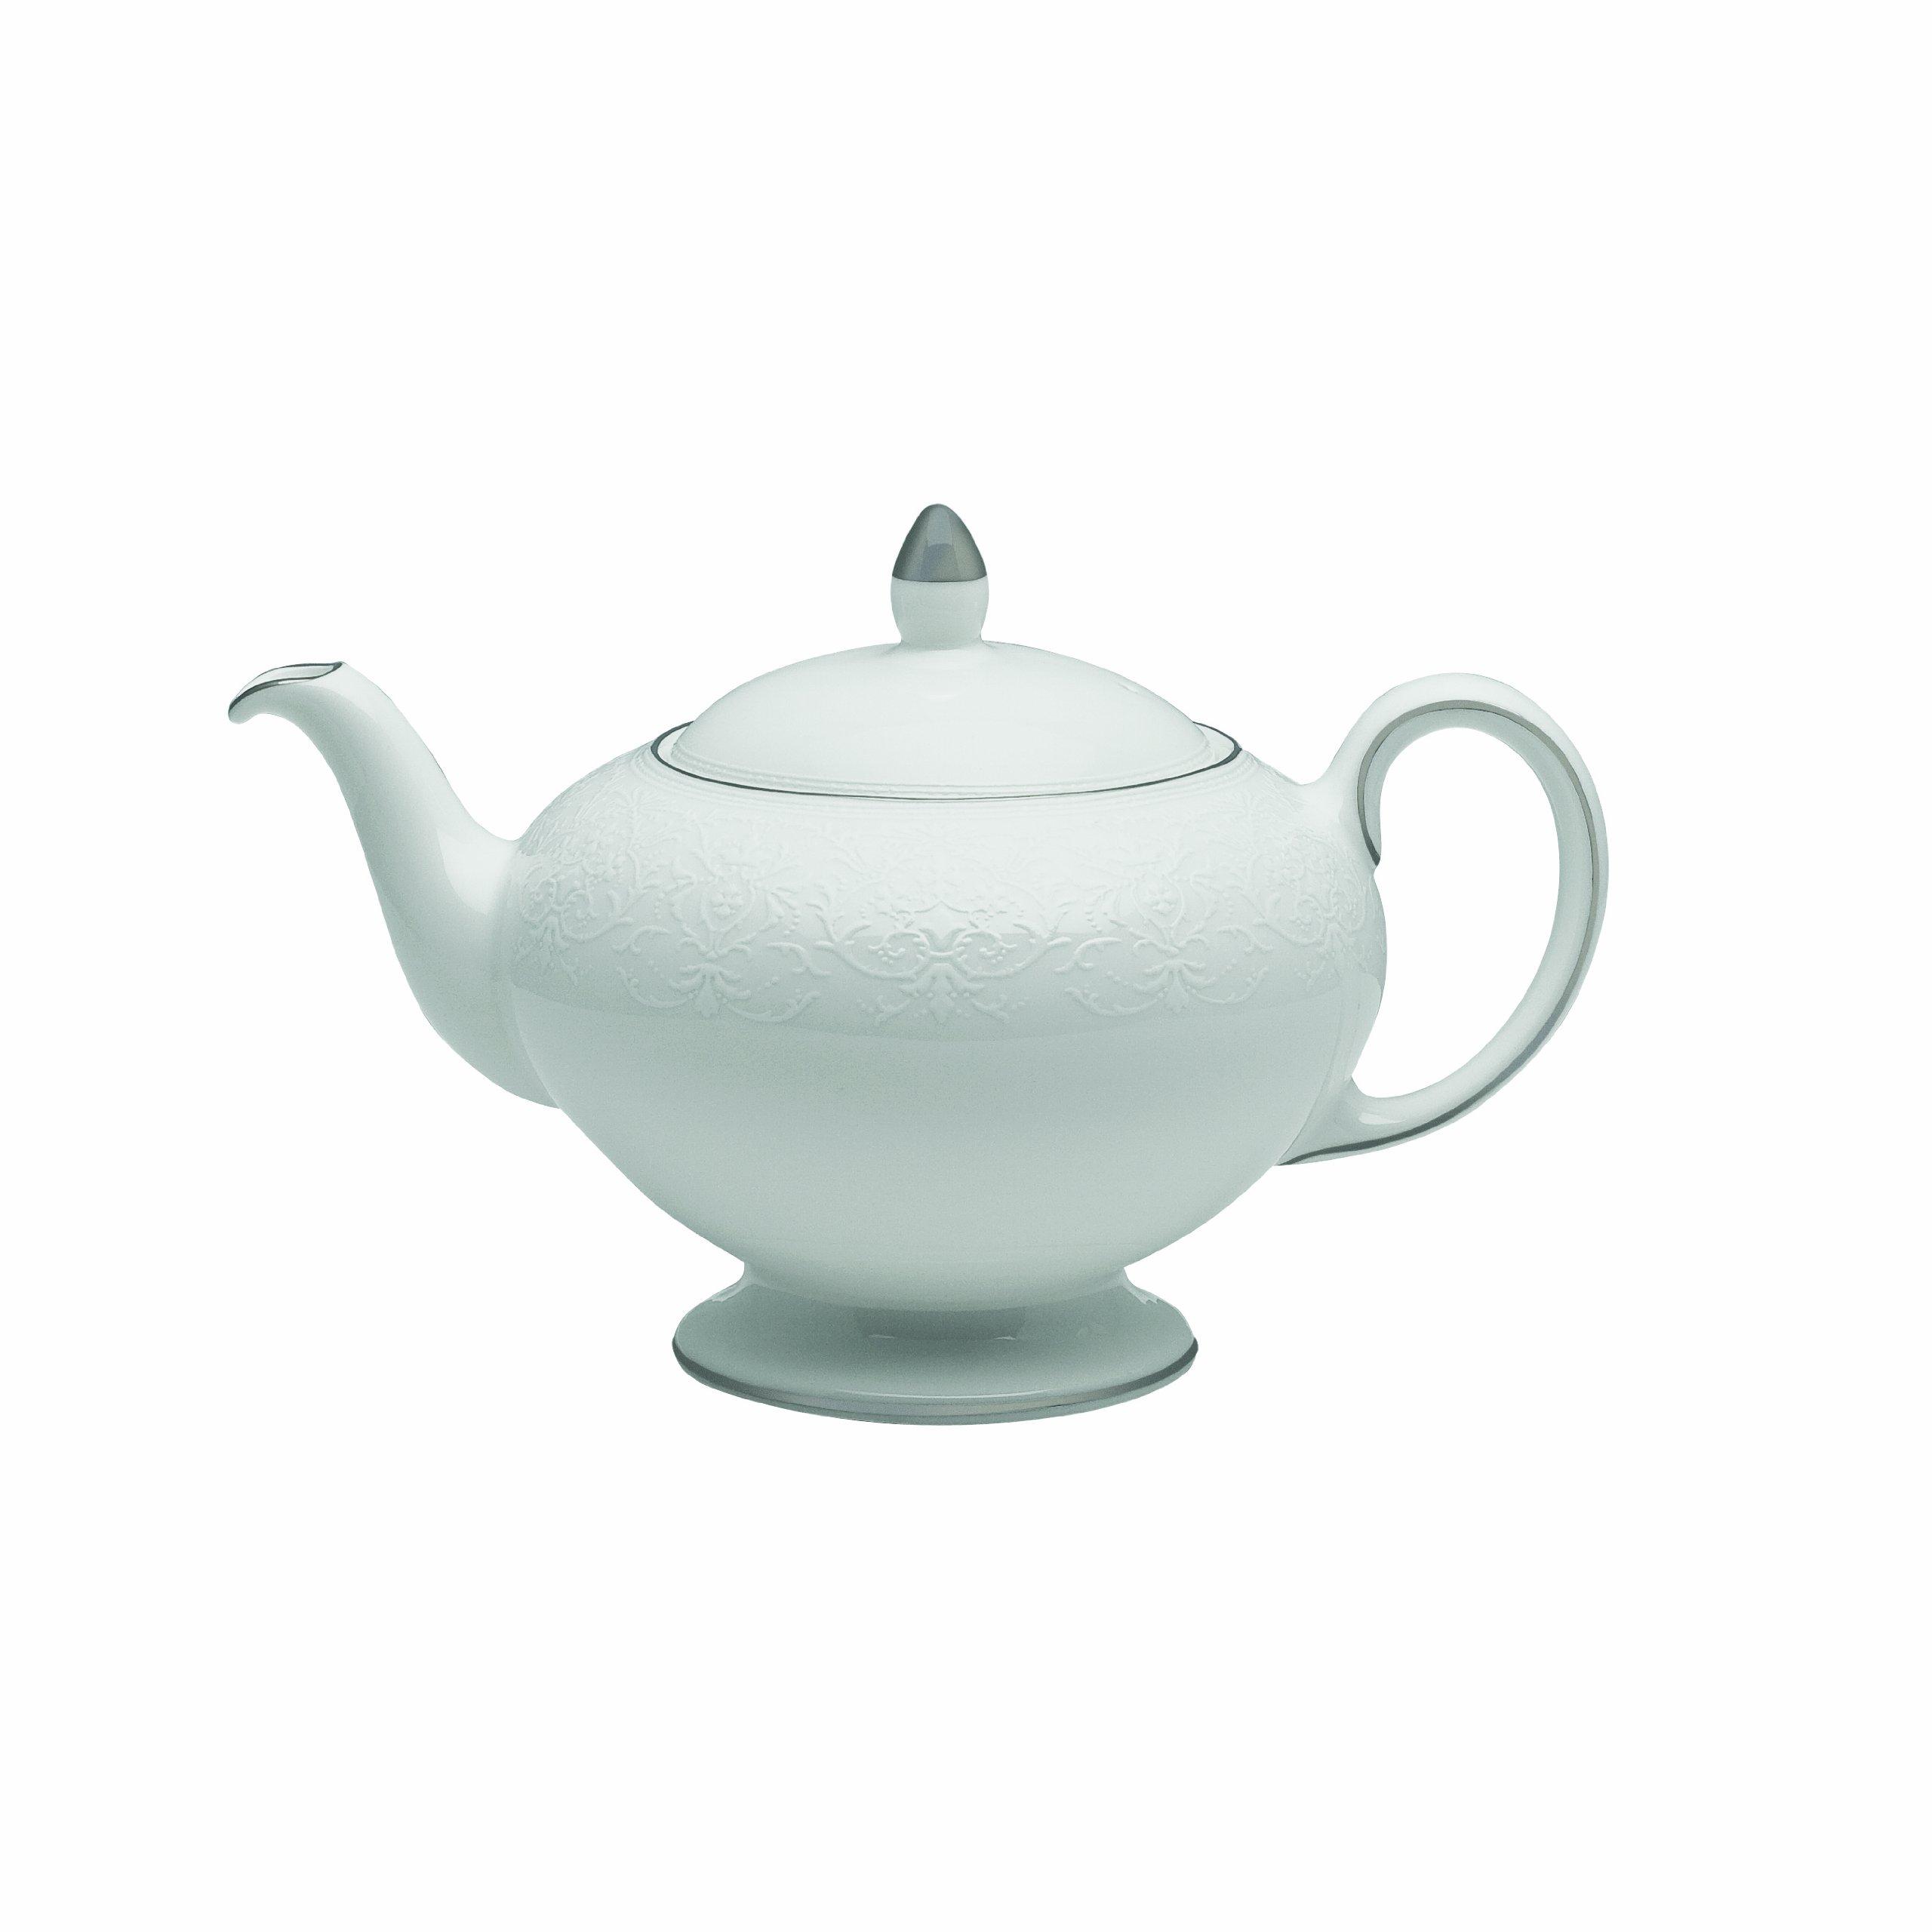 Wedgwood English Lace 36-Ounce Teapot